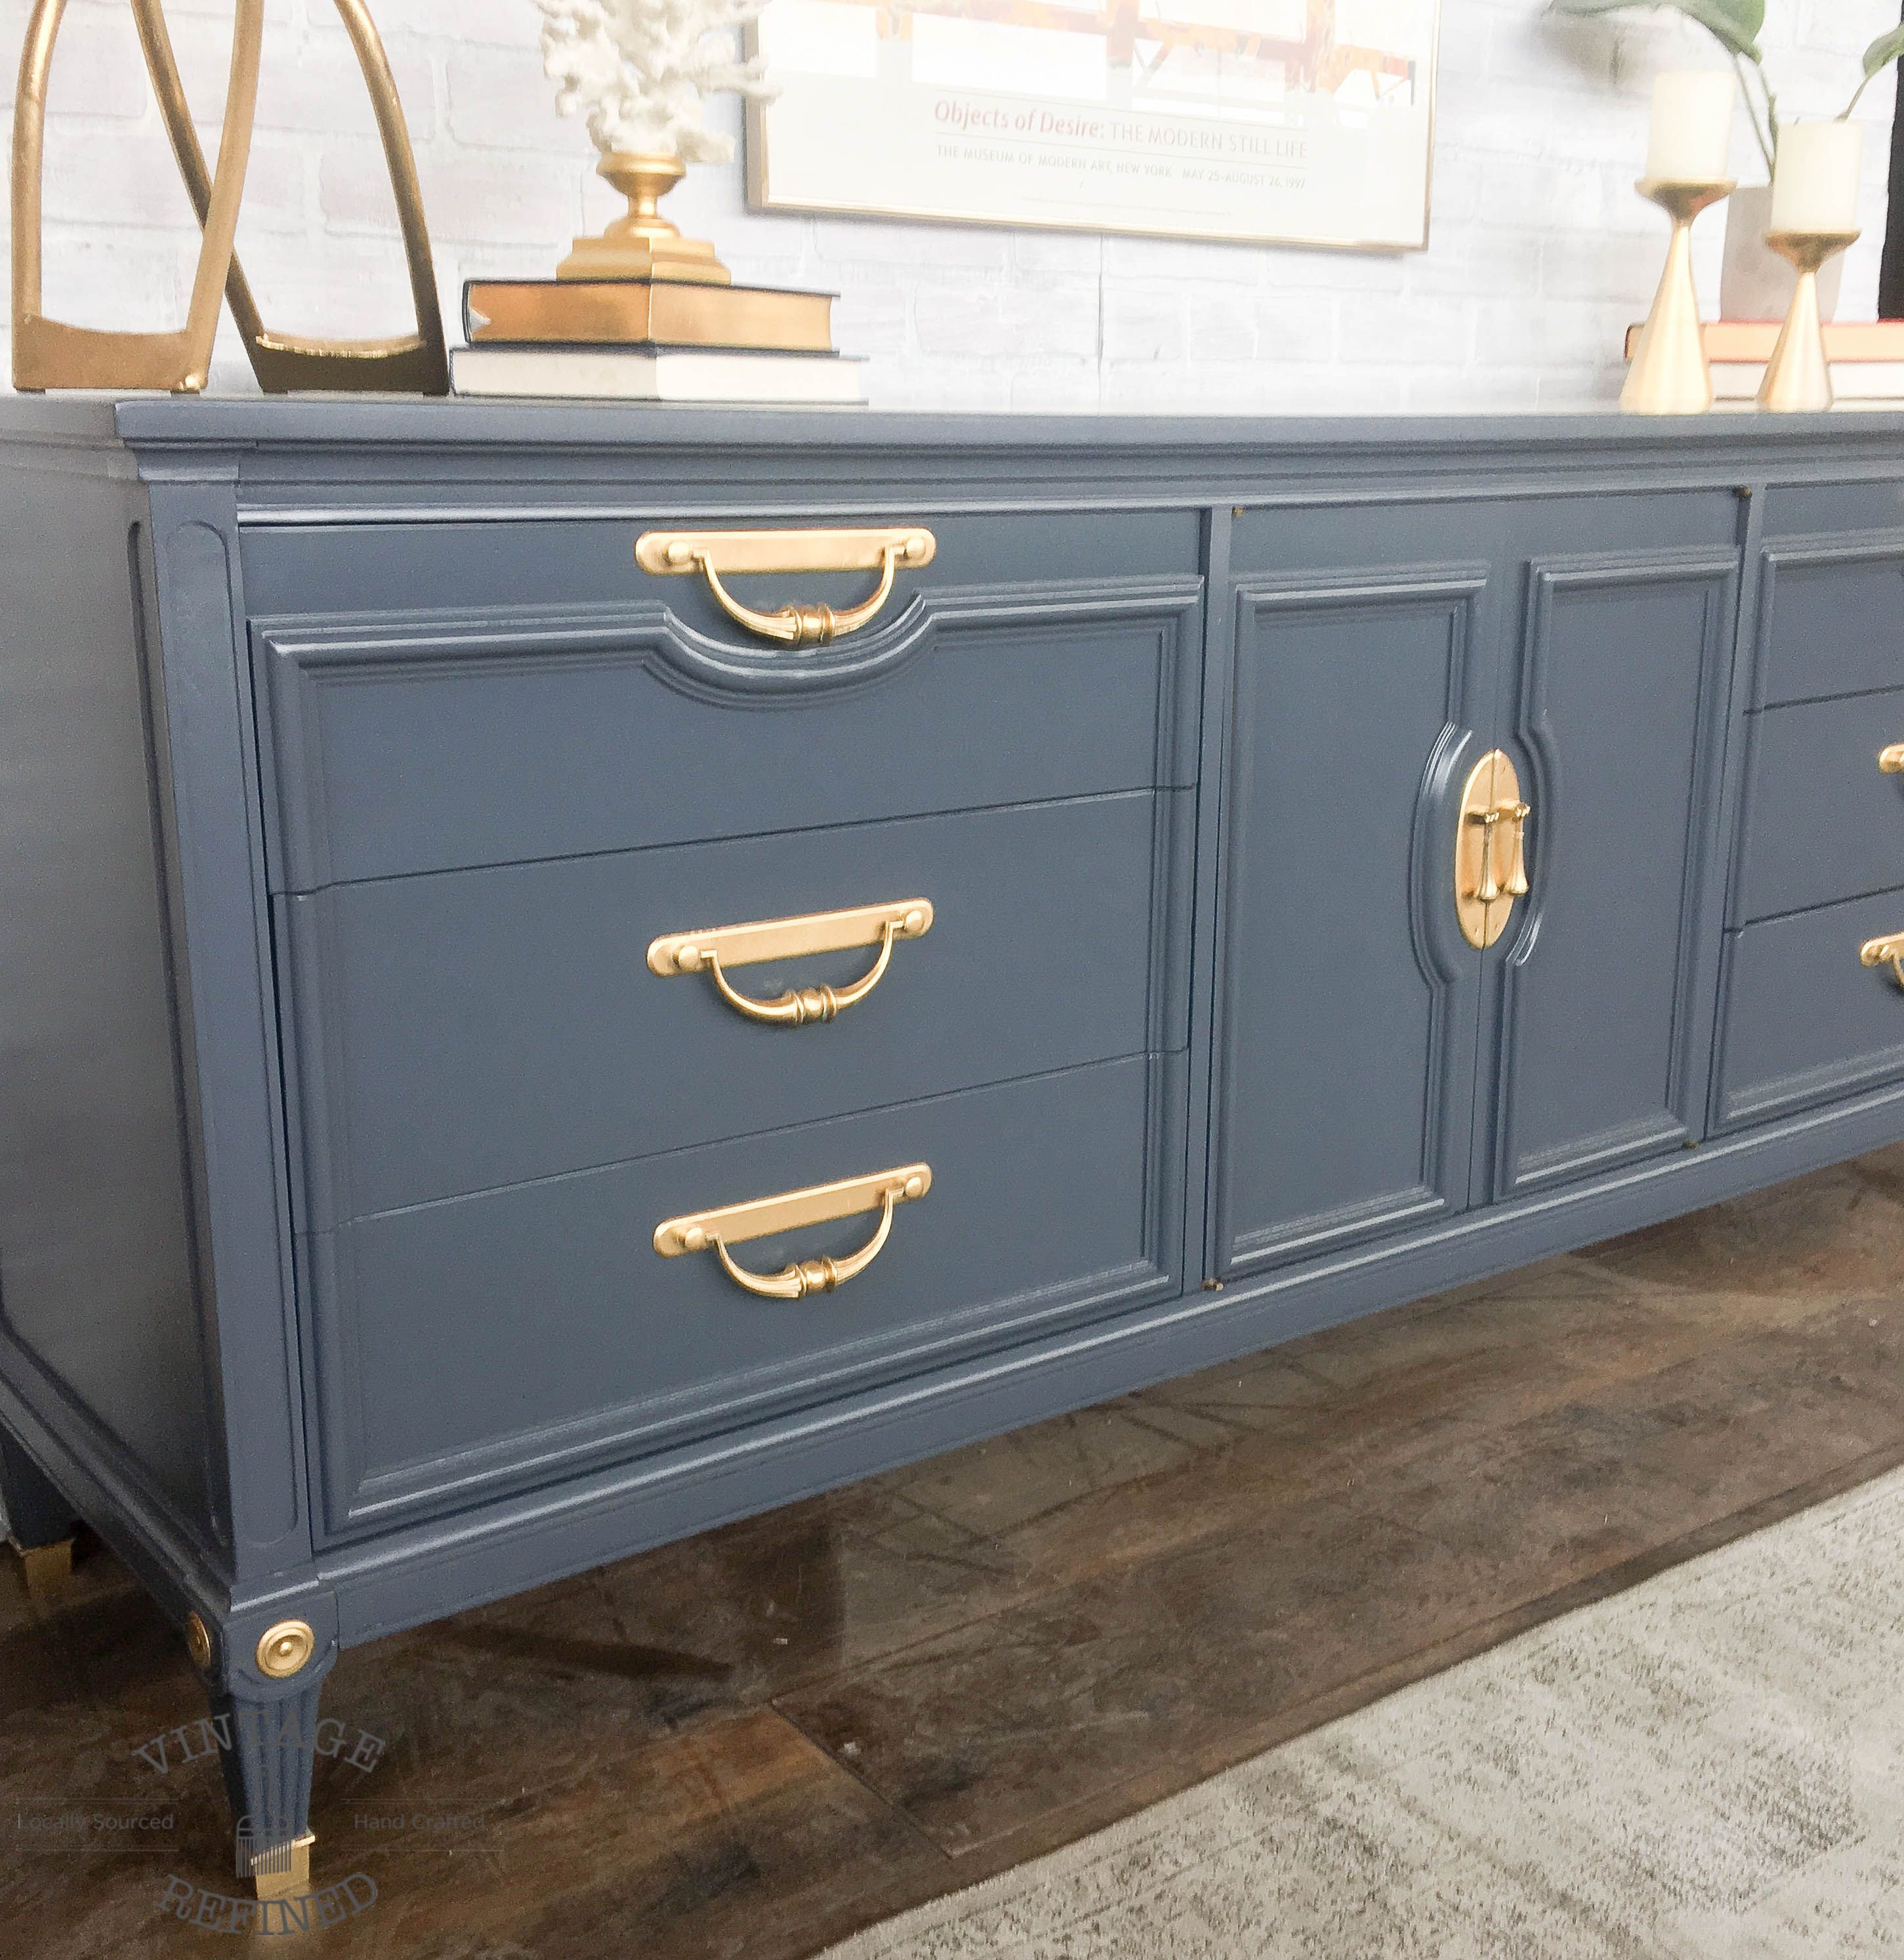 Modern Dresser Painted In Dark Grey Lacquer Furniture Makeover Recycled Furniture Painted Furniture